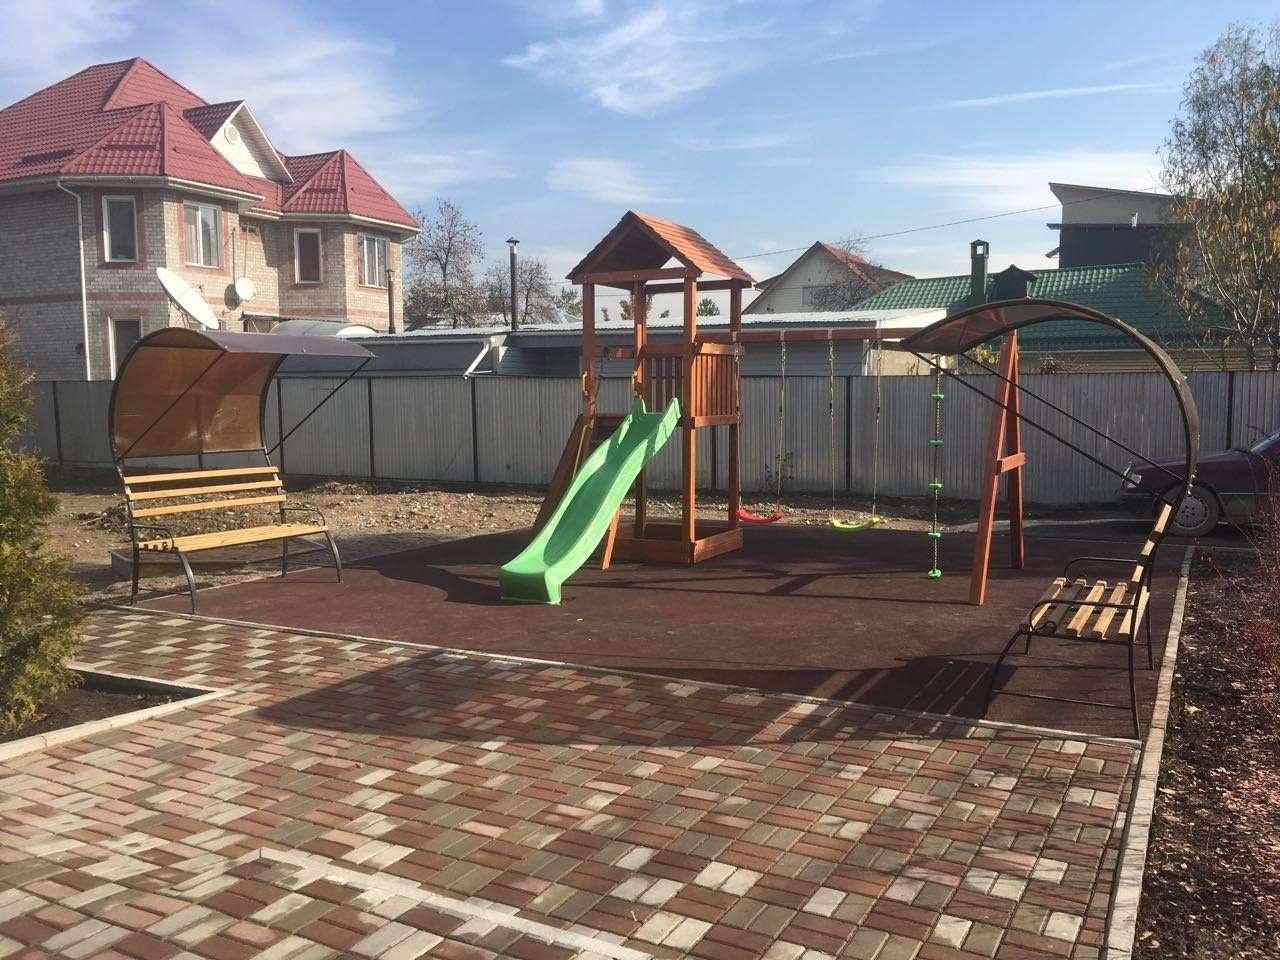 Во дворе приюта предусмотрена детская площадка